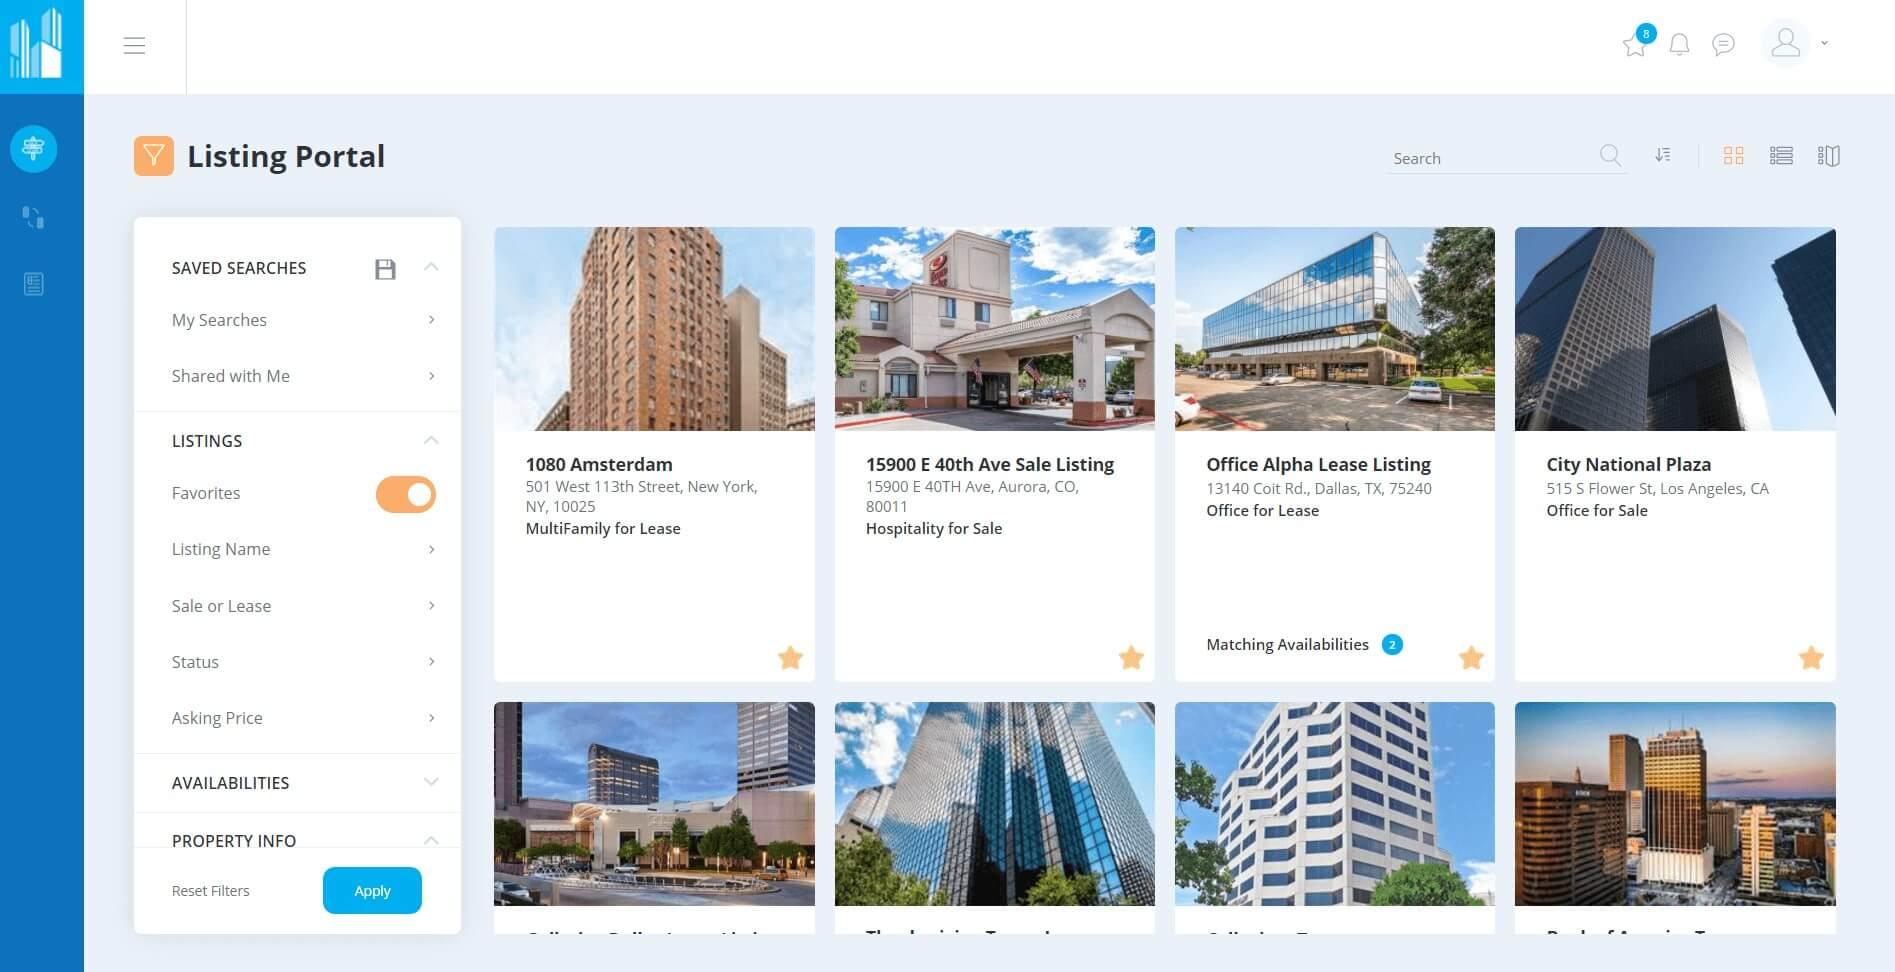 MarketSpace-by-Ascendix-Property-Listings-Portal-Overview